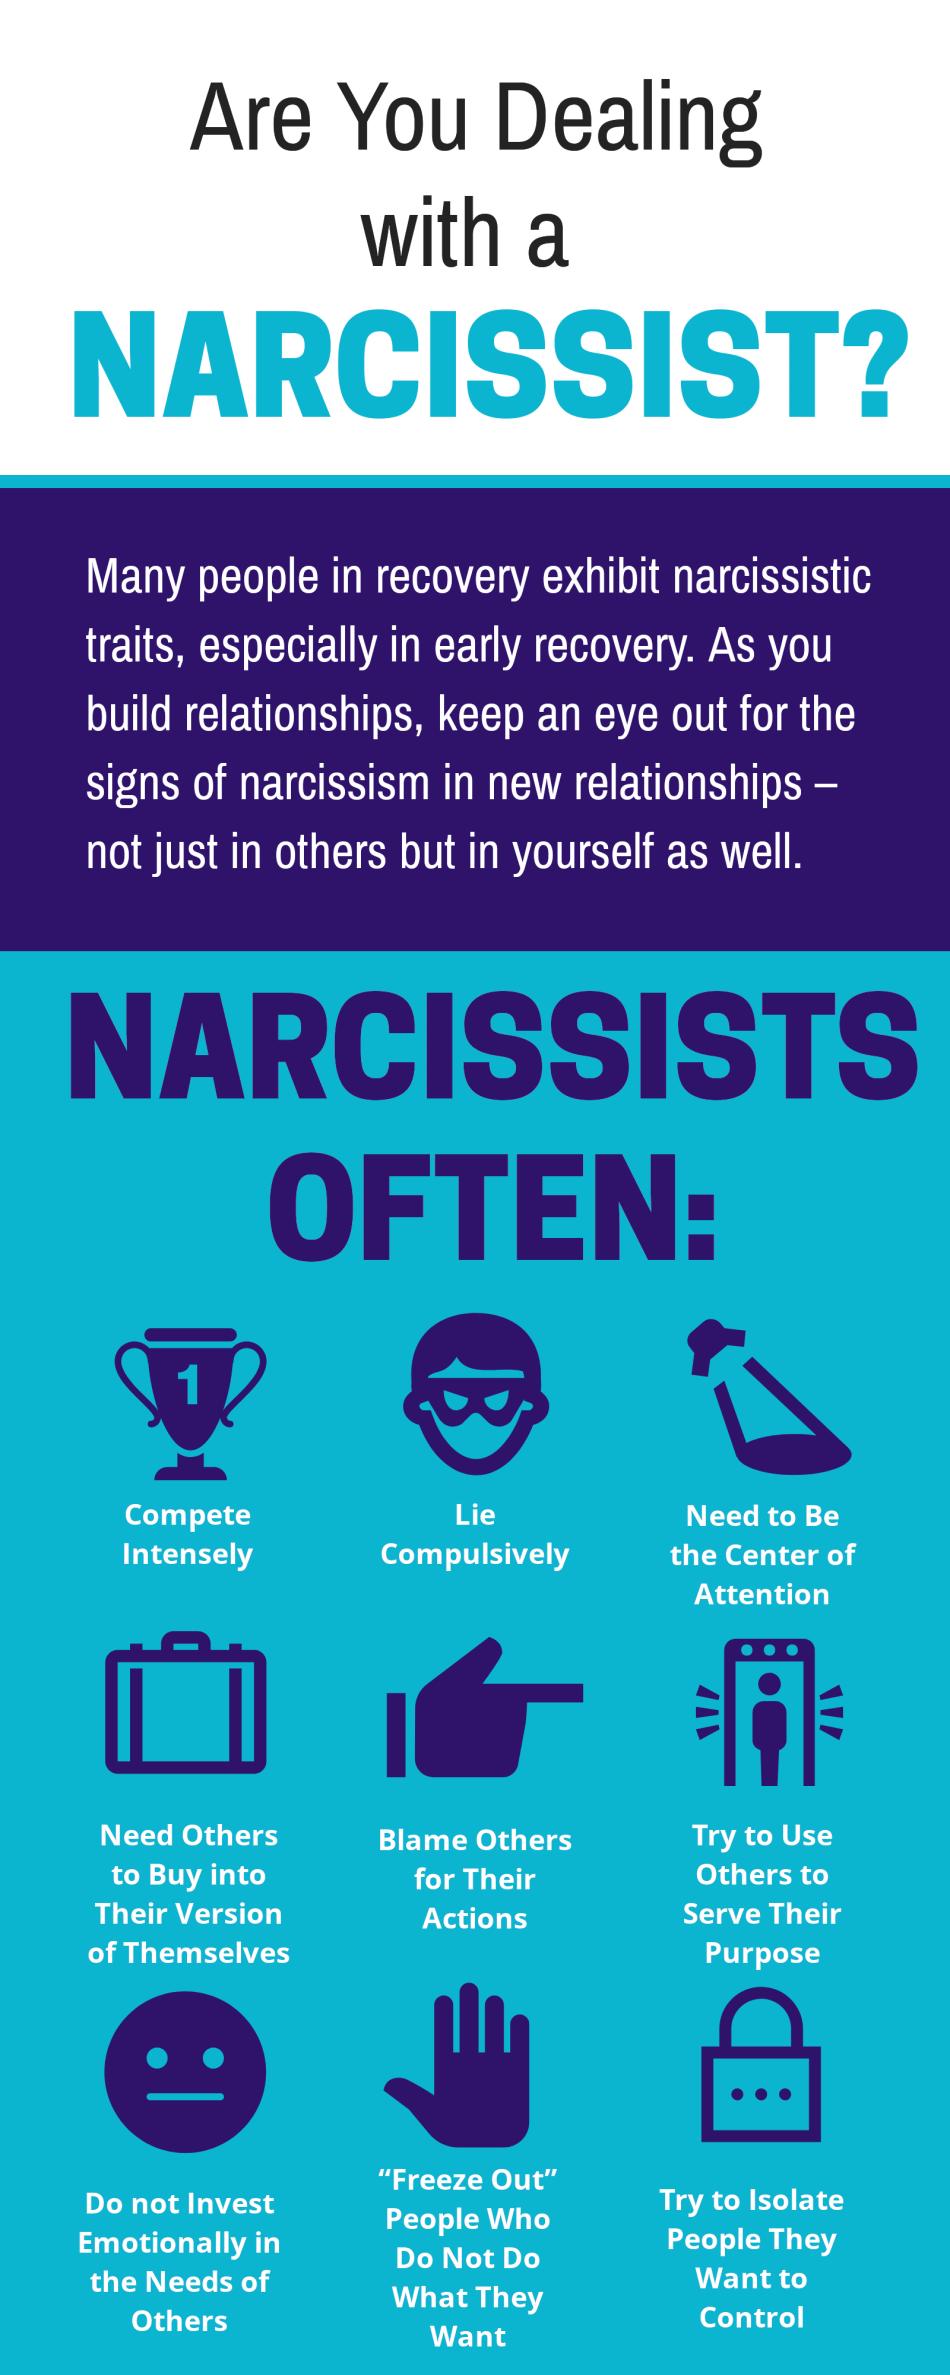 Pin by D B on Wisdom | Narcissism, Narcissistic behavior